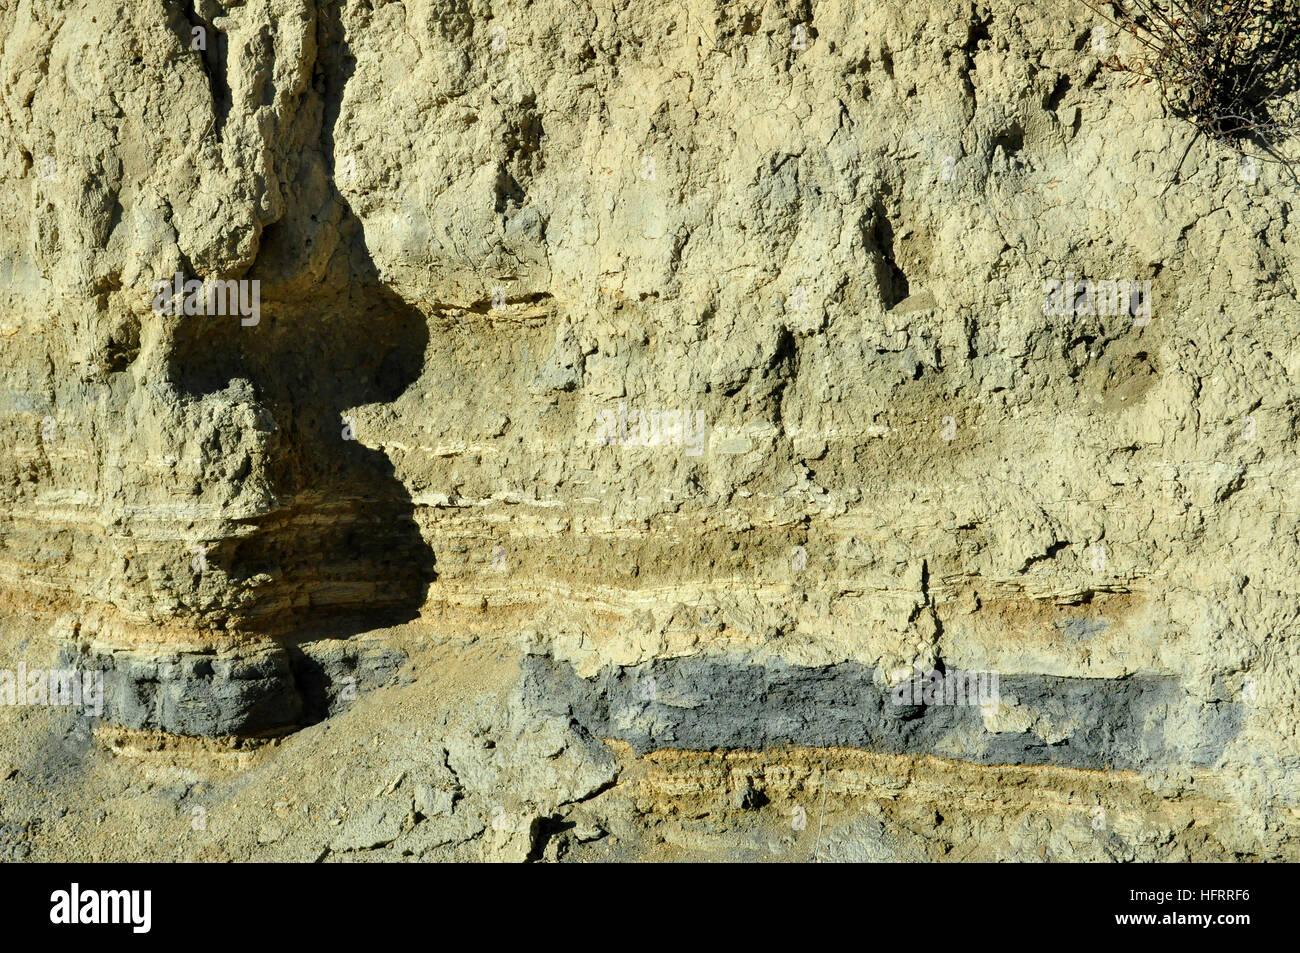 Capas de tierra con ceniza paleontológico Imagen De Stock